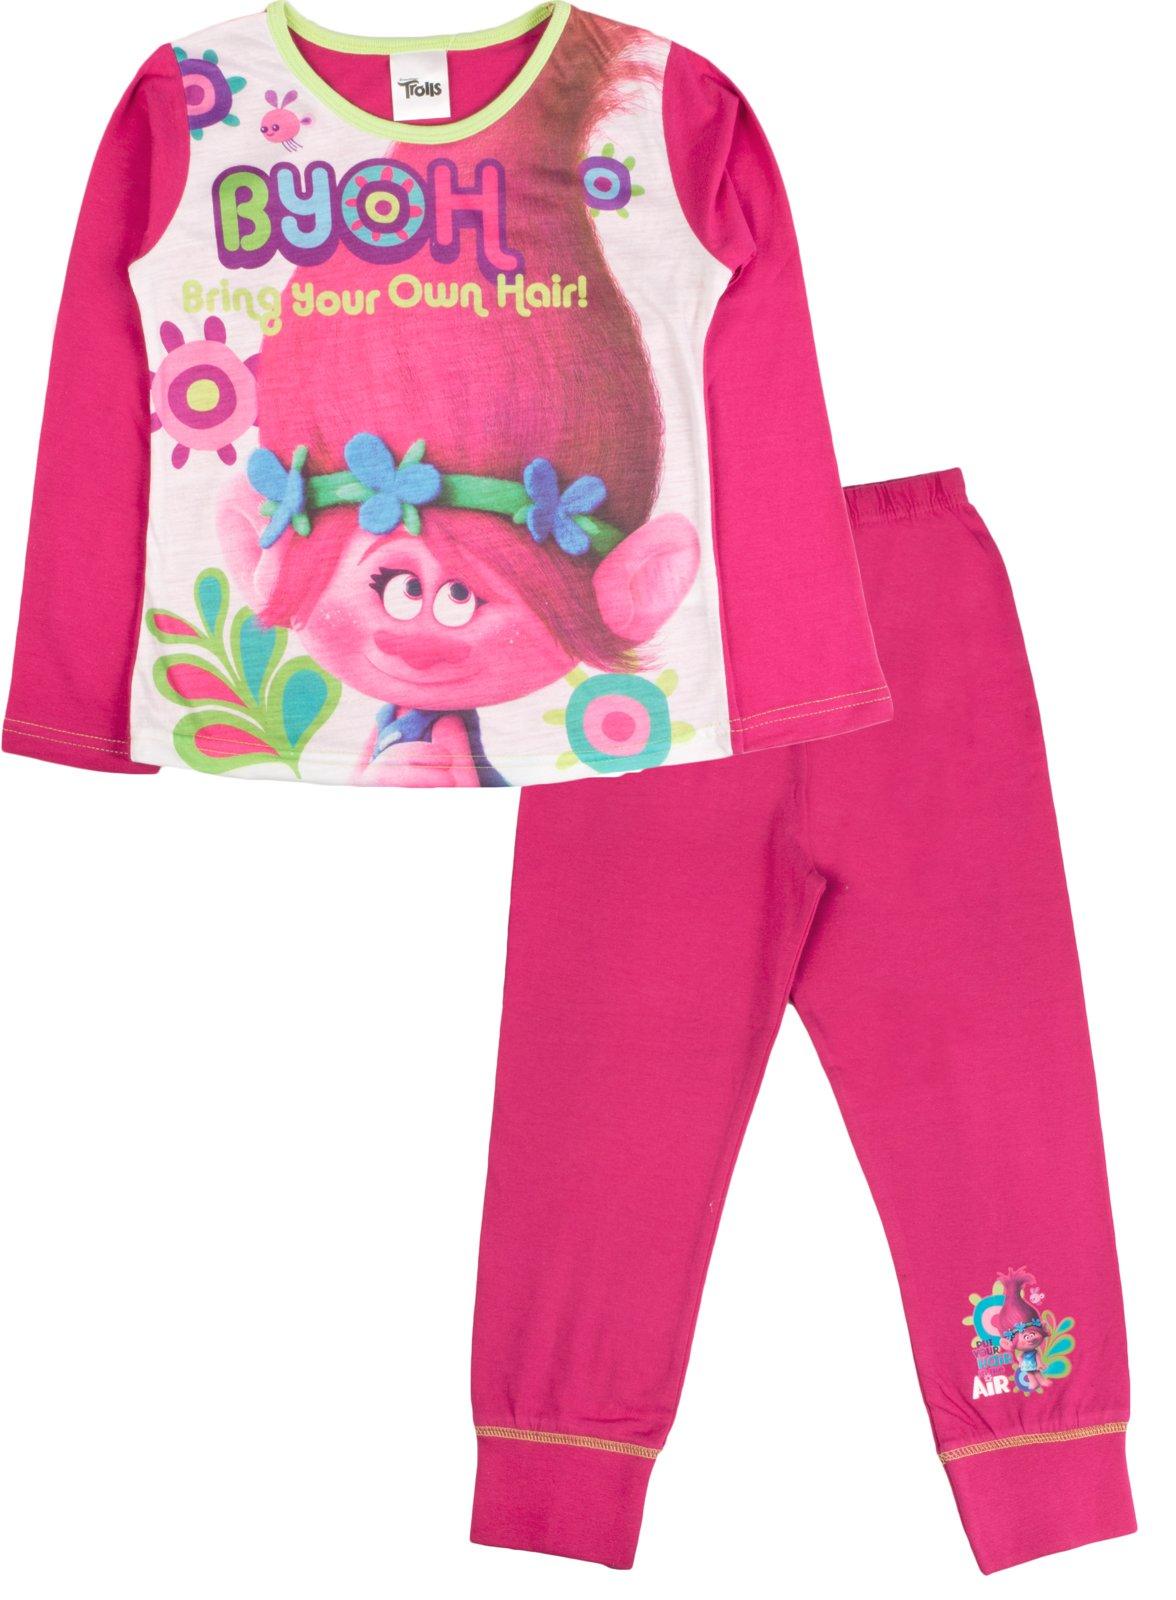 Lora Dora Girl's Pyjamas Piece Set 4-5 Years Trolls - Byoh